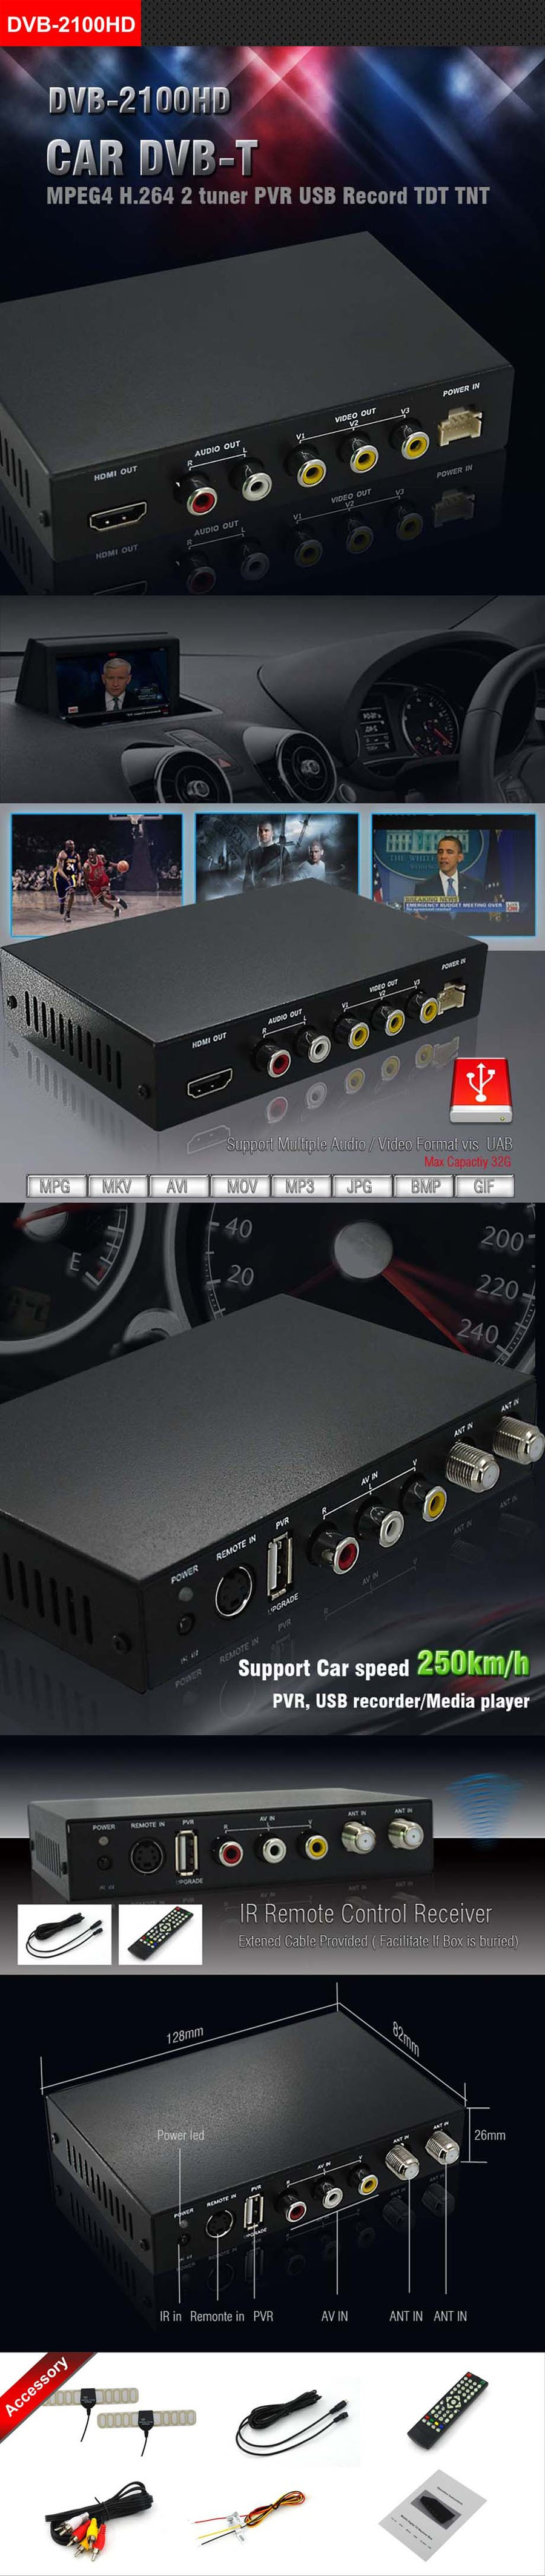 car dvb-t tdt tnt receiver